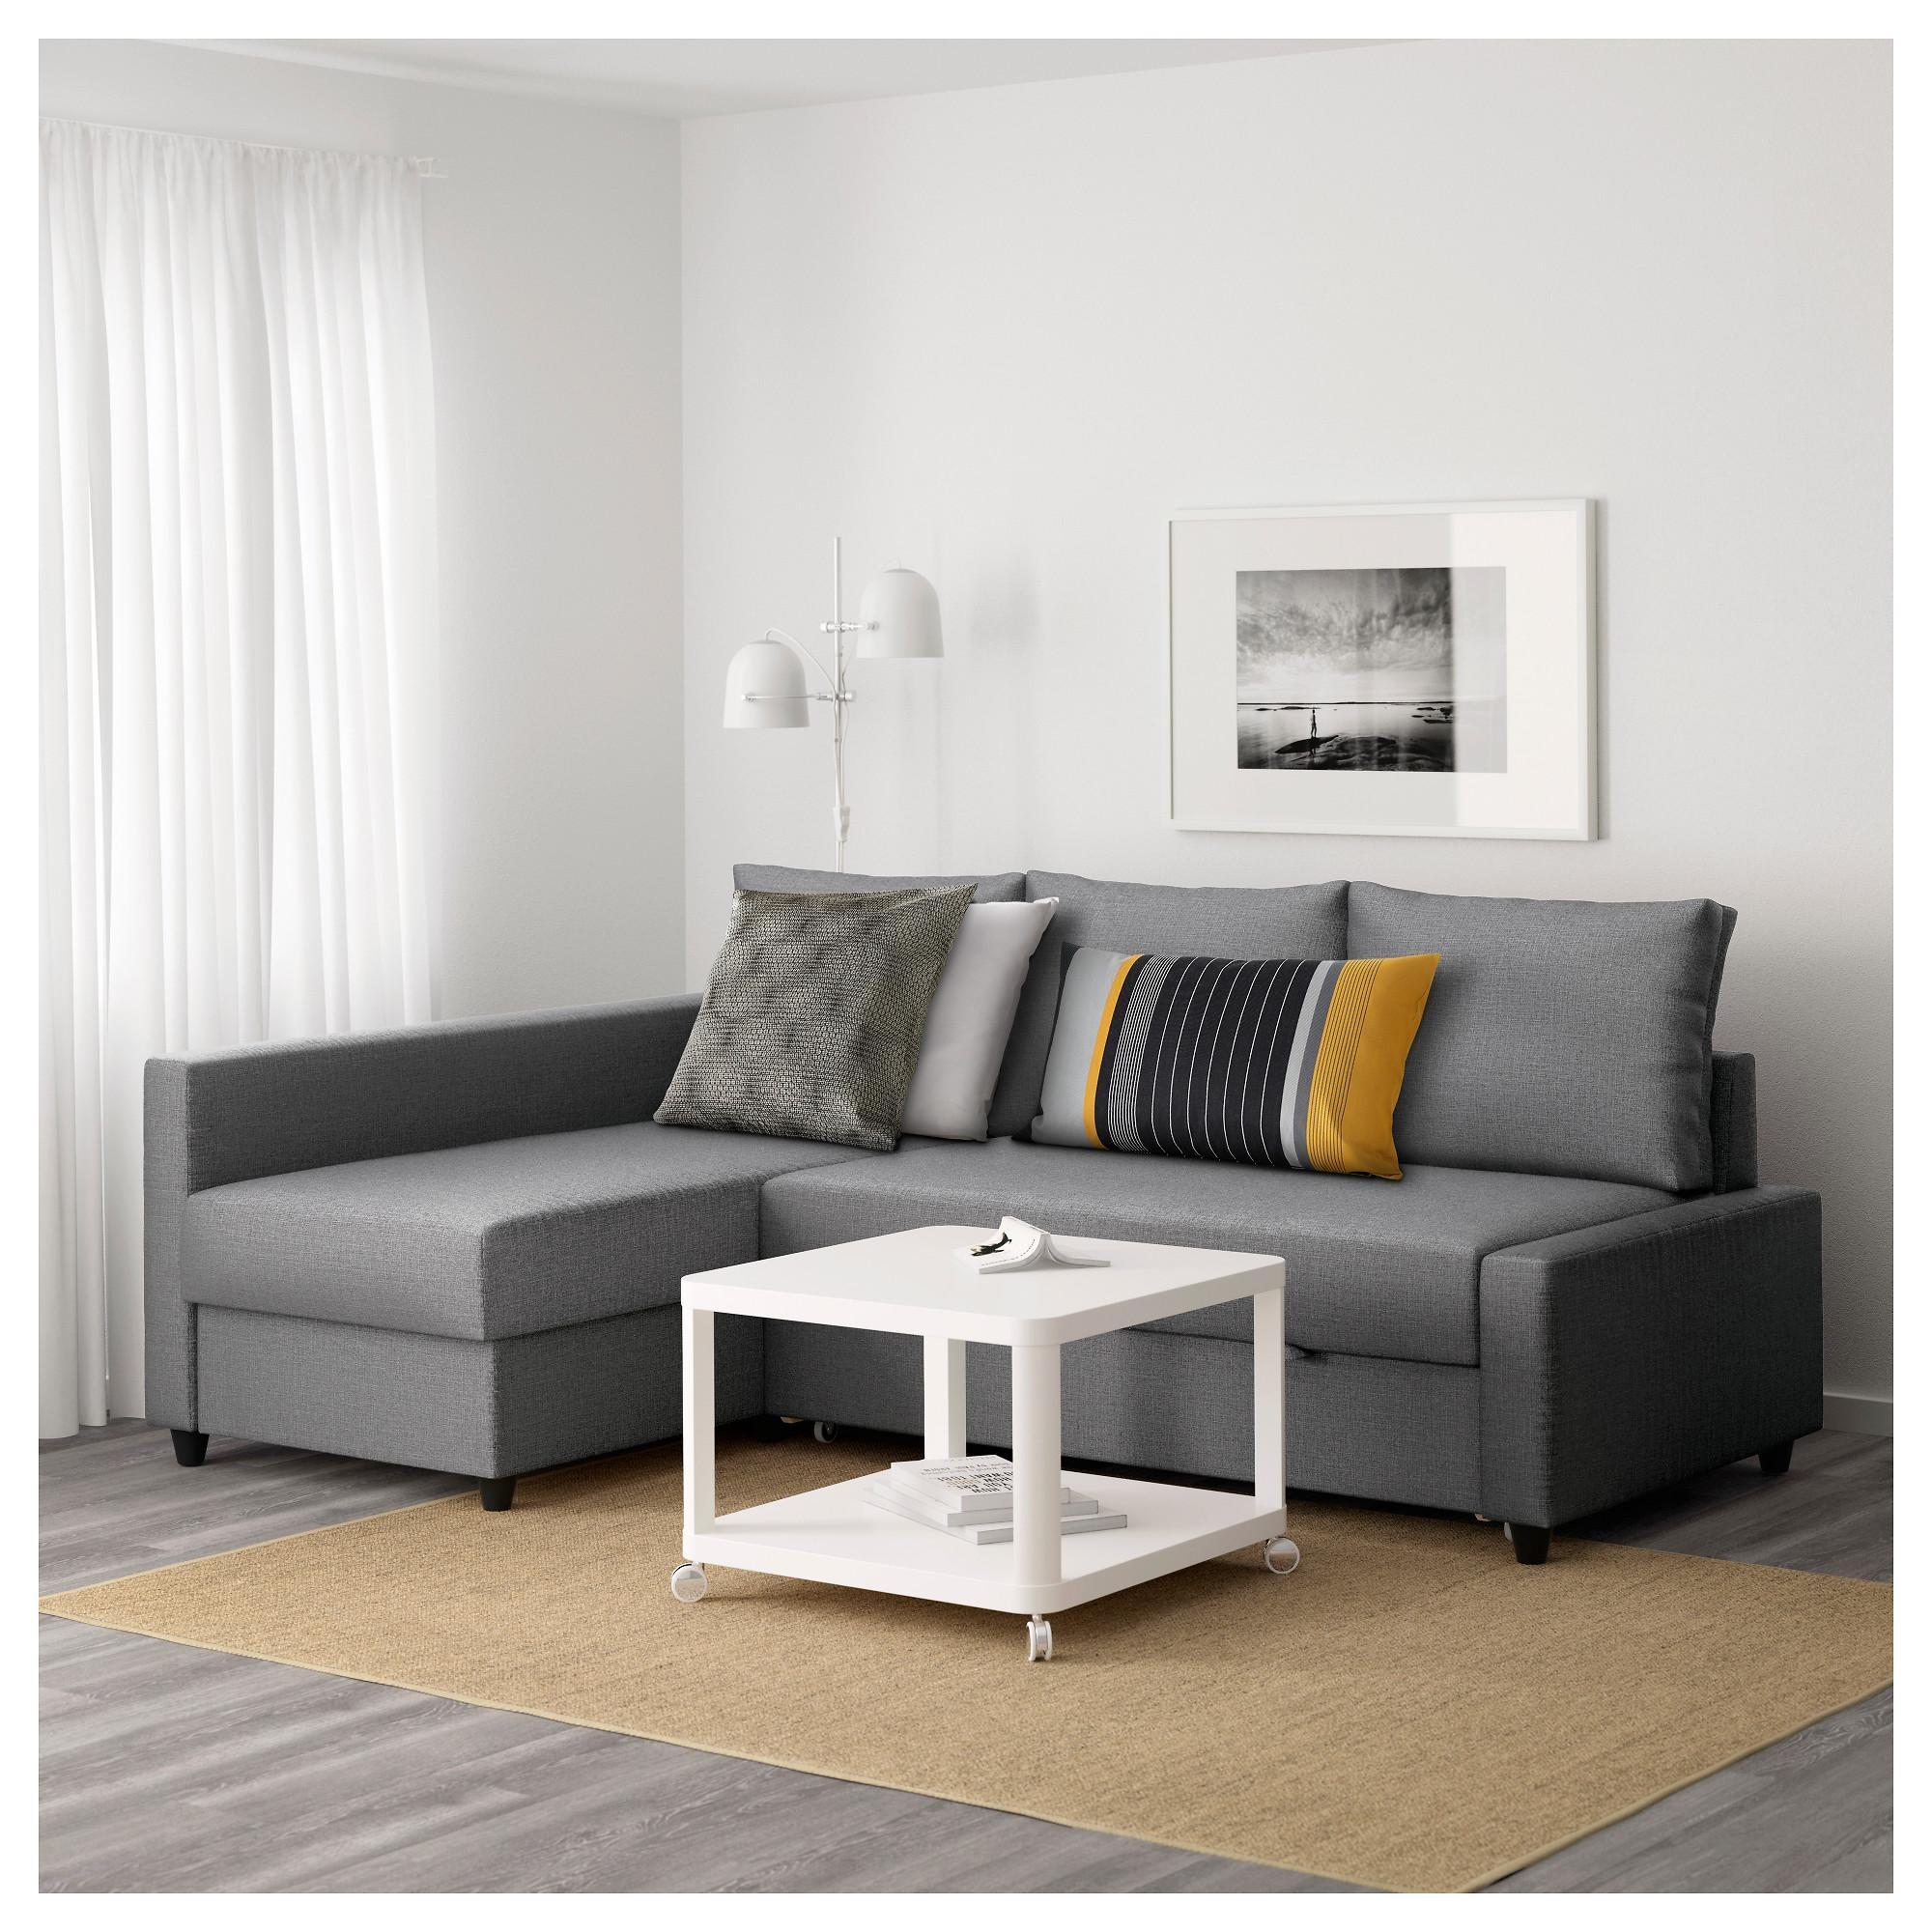 Friheten Corner Sofa Bed With Storage Skiftebo Dark Grey – Ikea Pertaining To Ikea Corner Sofa Bed With Storage (View 5 of 20)